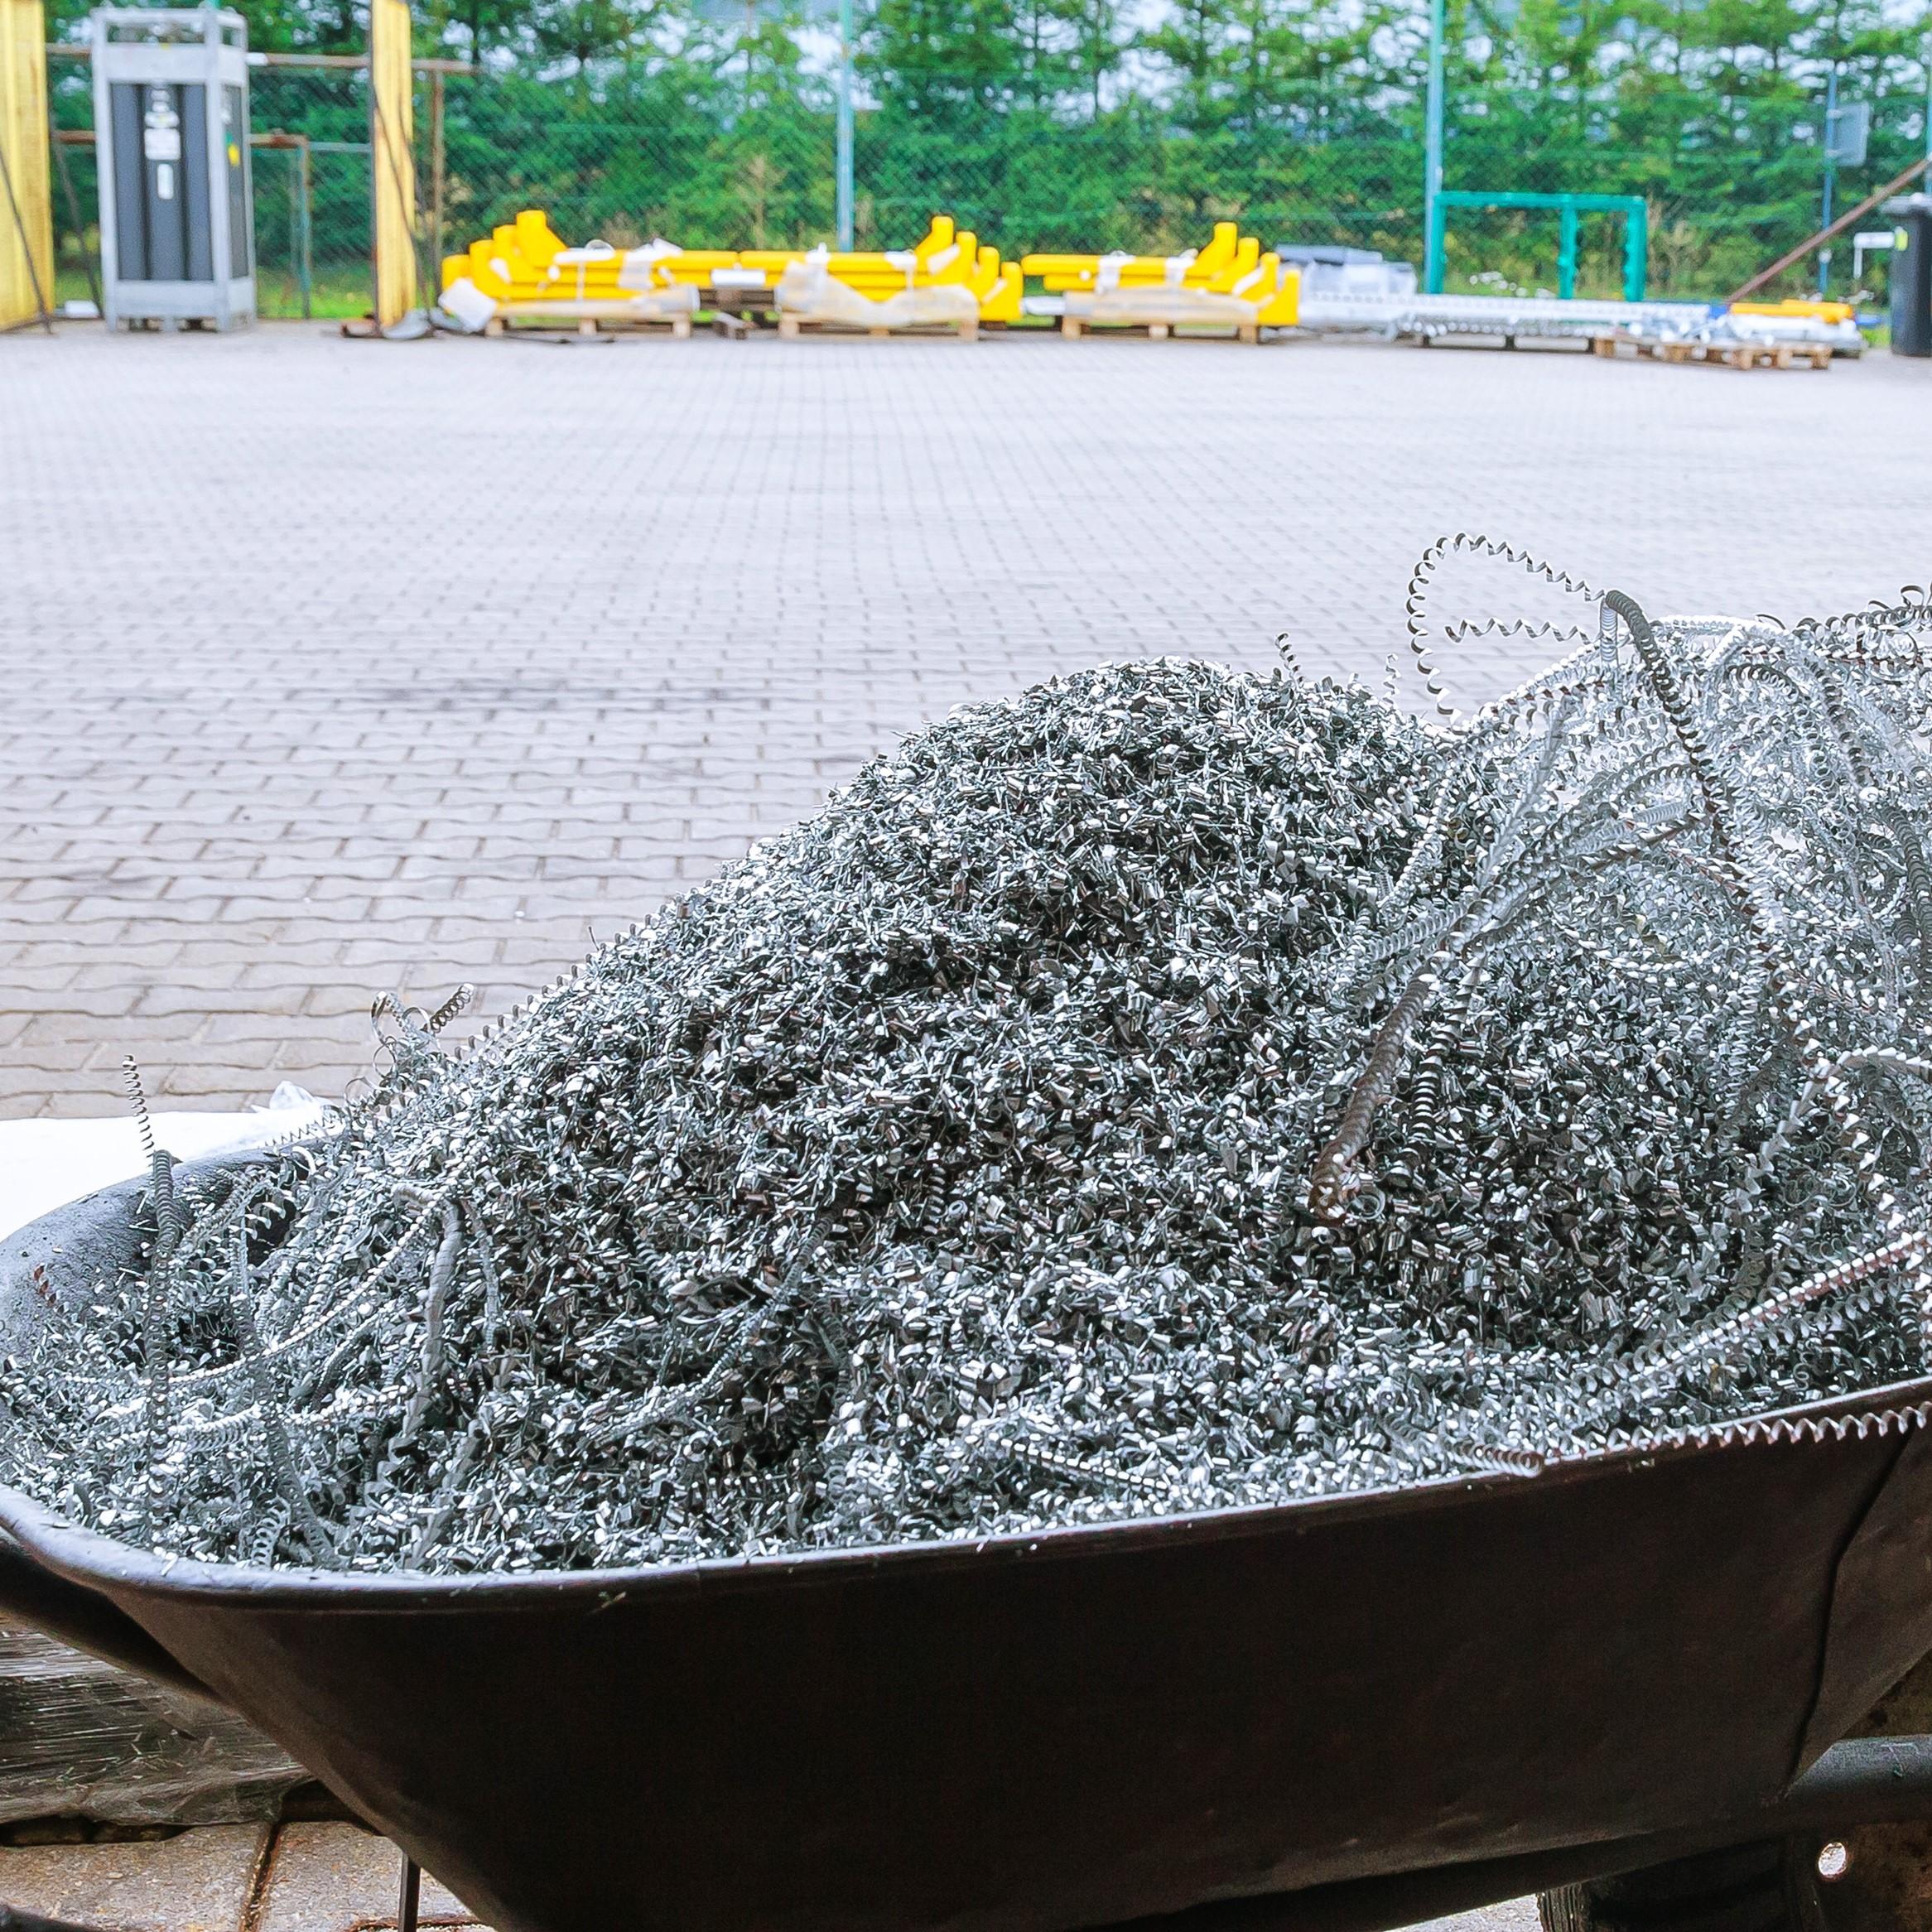 Ekstrakcja podczas cięcia aluminium